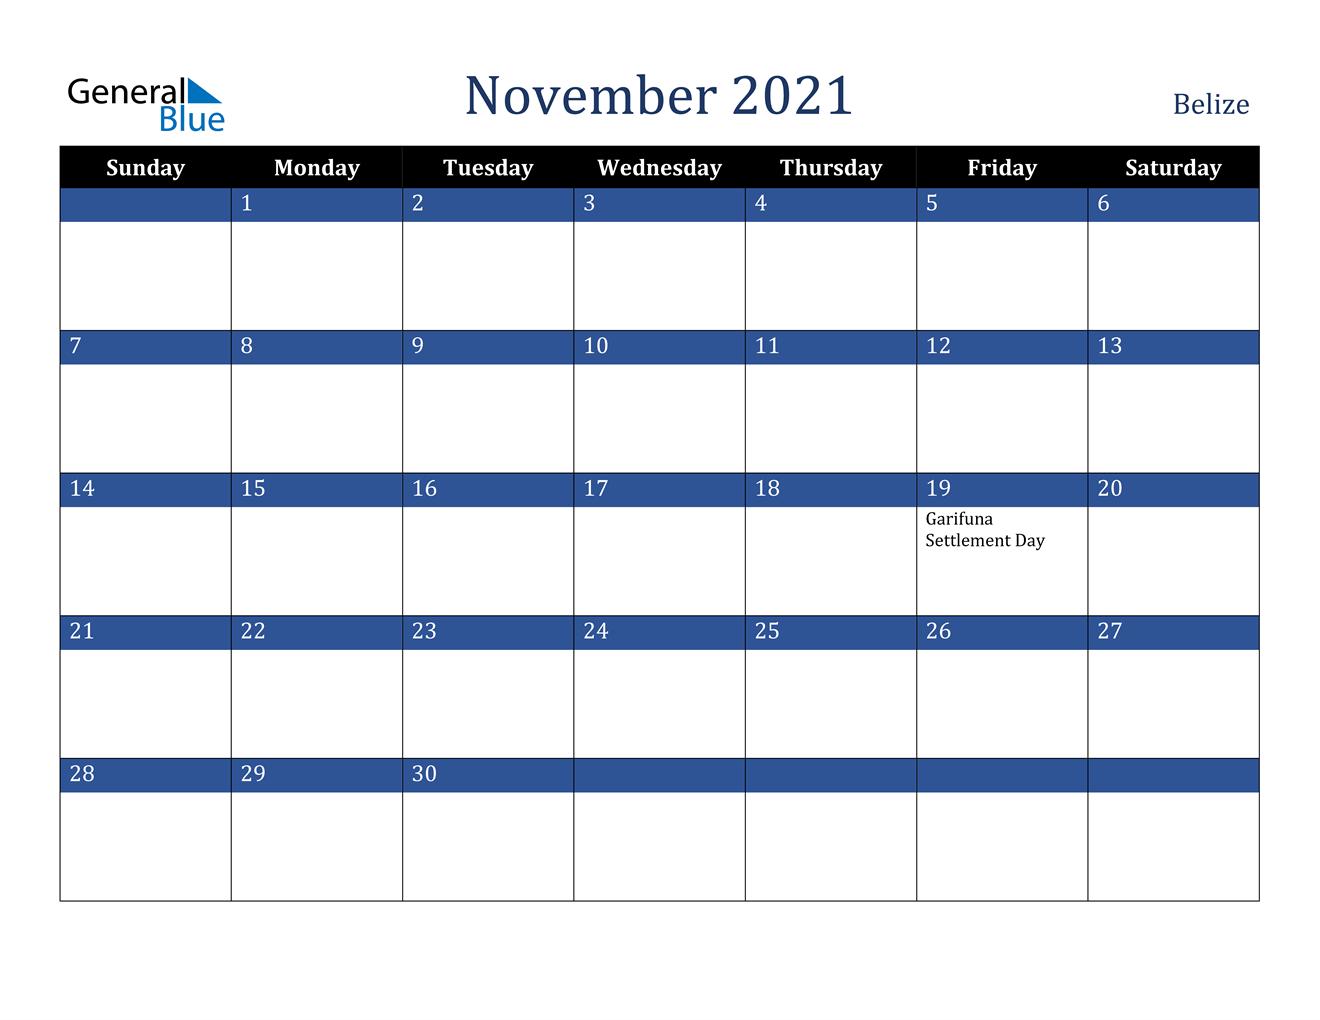 November 2021 Calendar - Belize